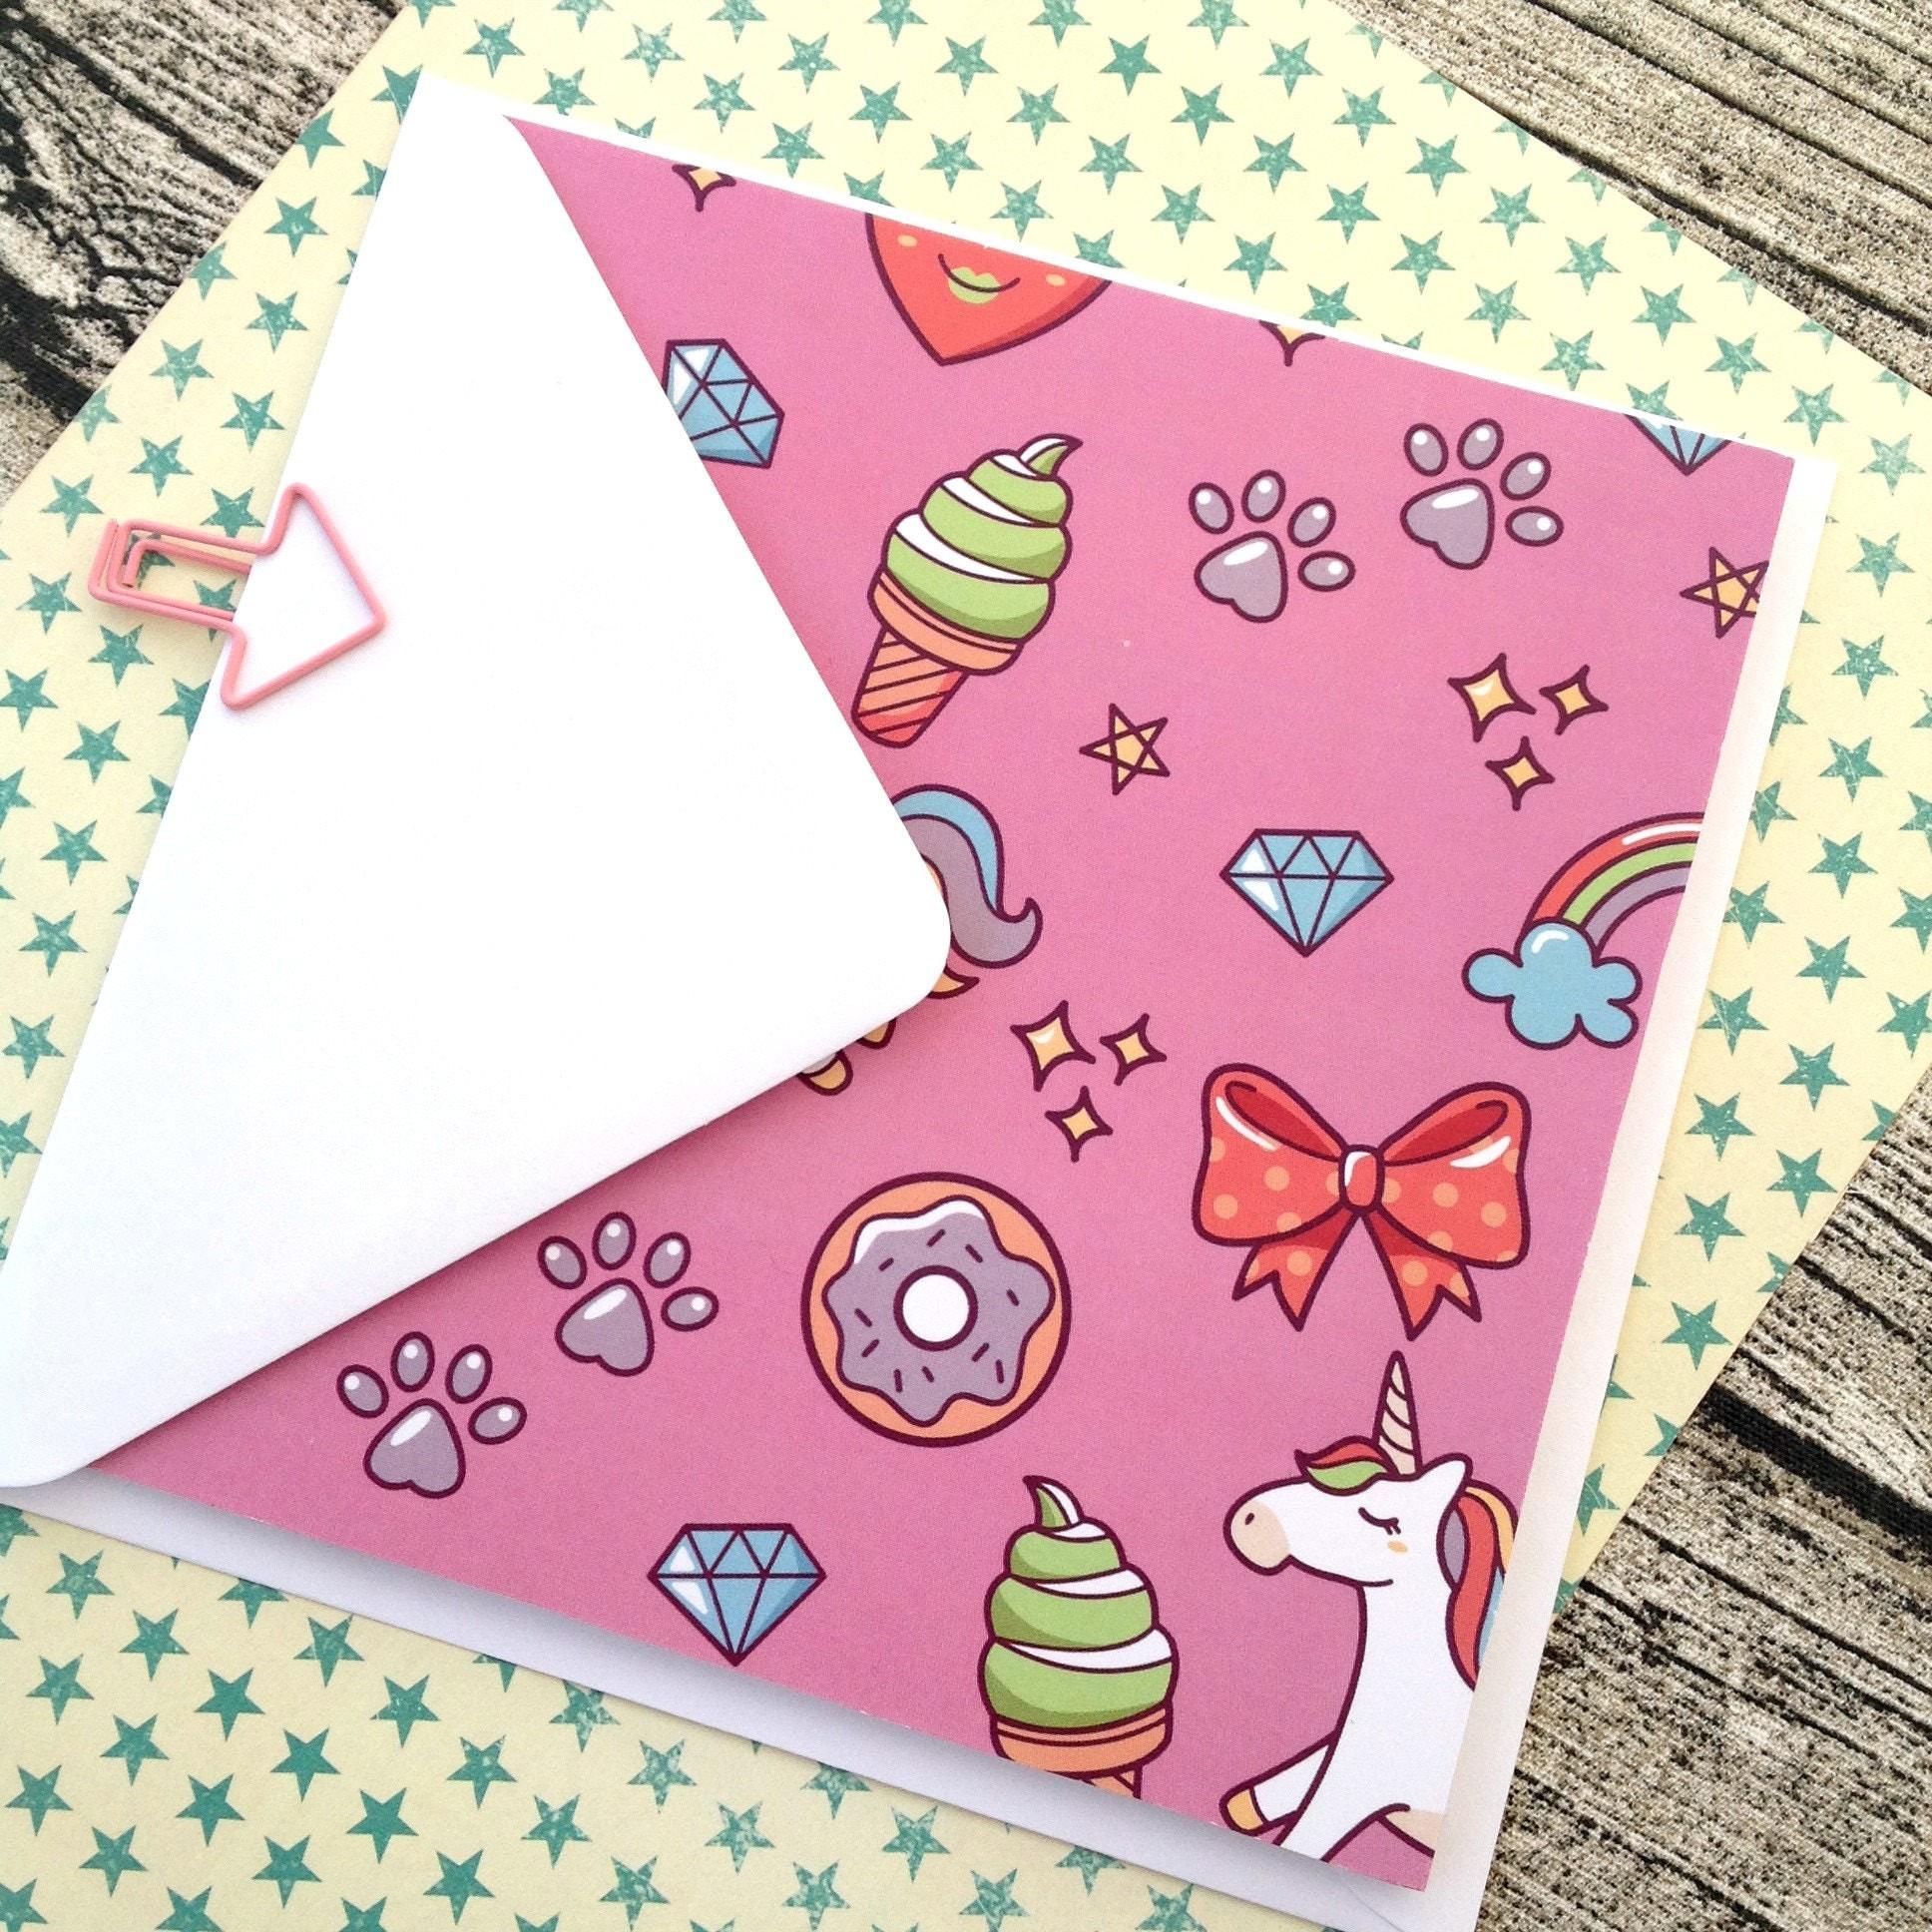 Greetings Cards Birthday Gallery Free Birthday Cards